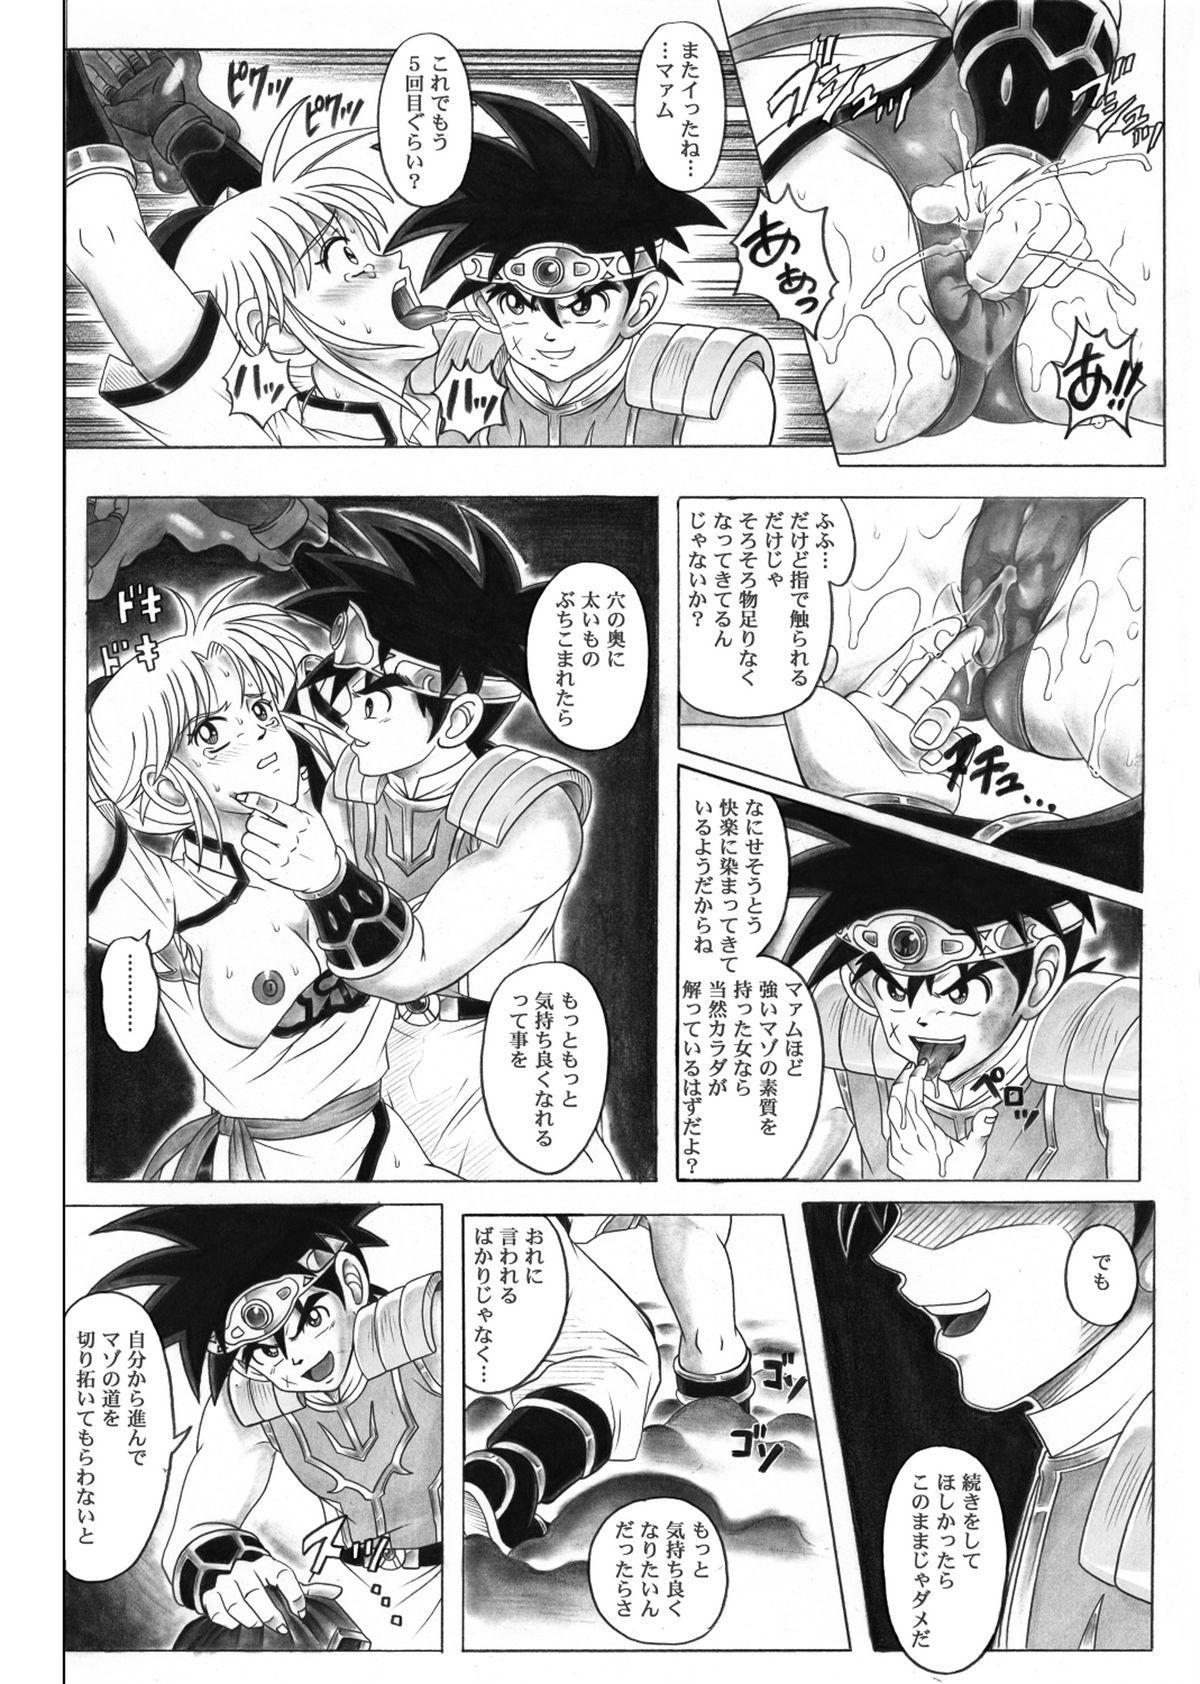 [Cyclone (Reizei, Izumi)] STAR TAC IDO ~Youkuso Haja no Doukutsu he~ Chuuhen Download edition (Dragon Warrior: Dai's Great Adventure) [Digital] 51